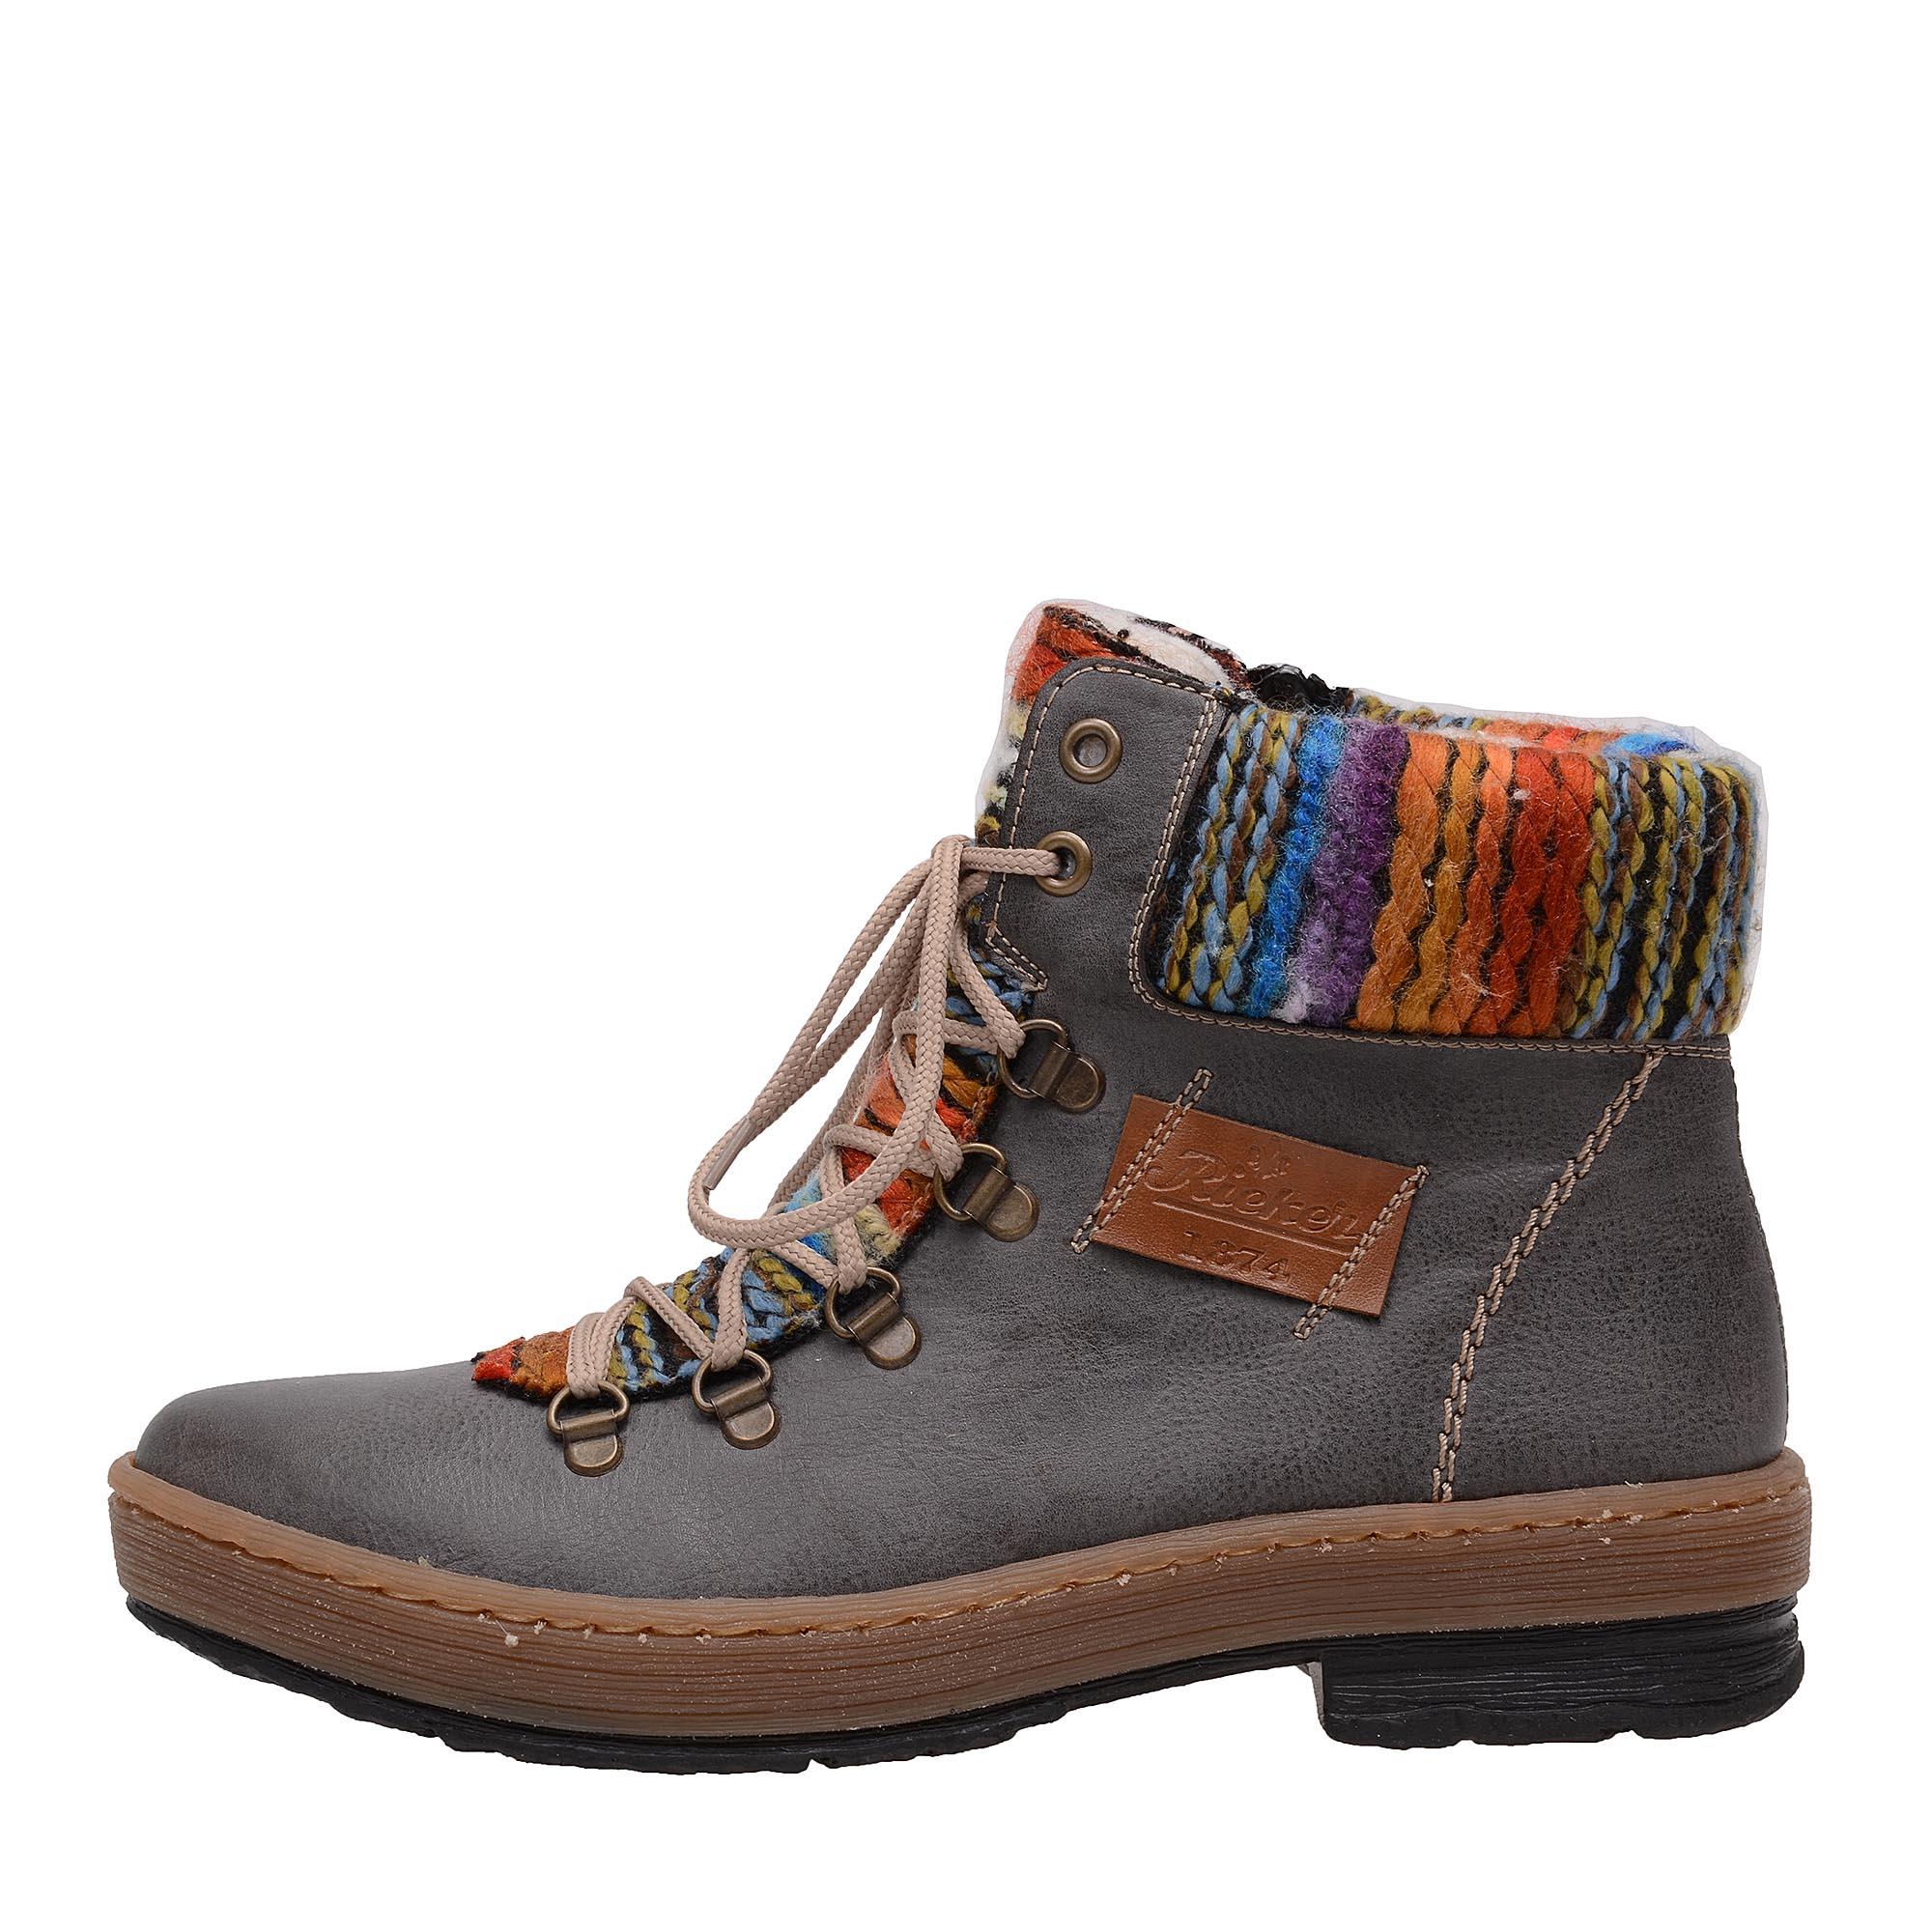 d15a9d80f9d18 Dámska obuv RIEKER Z6743/45 GRAU KOMBI H/W 7 | Rieker